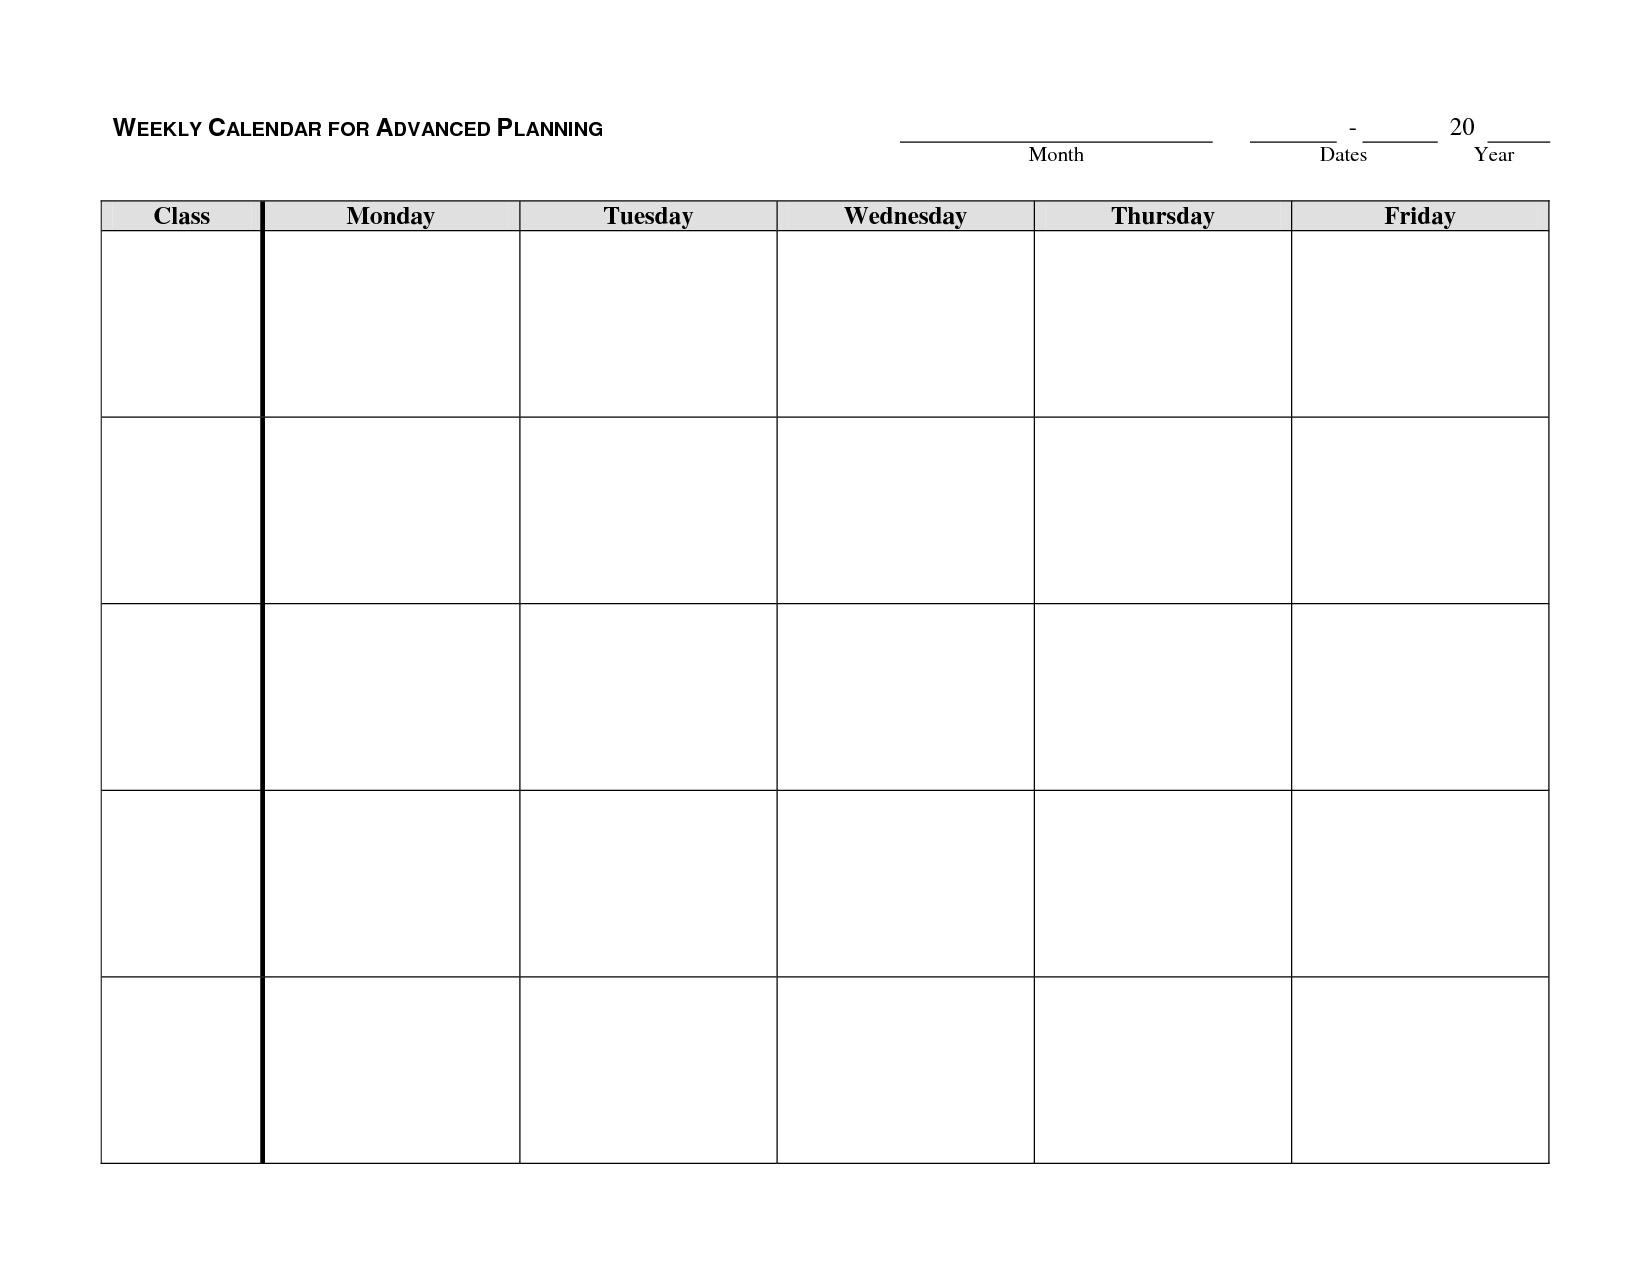 Monthly Calendar Template Monday To Friday - Template Calendar Design